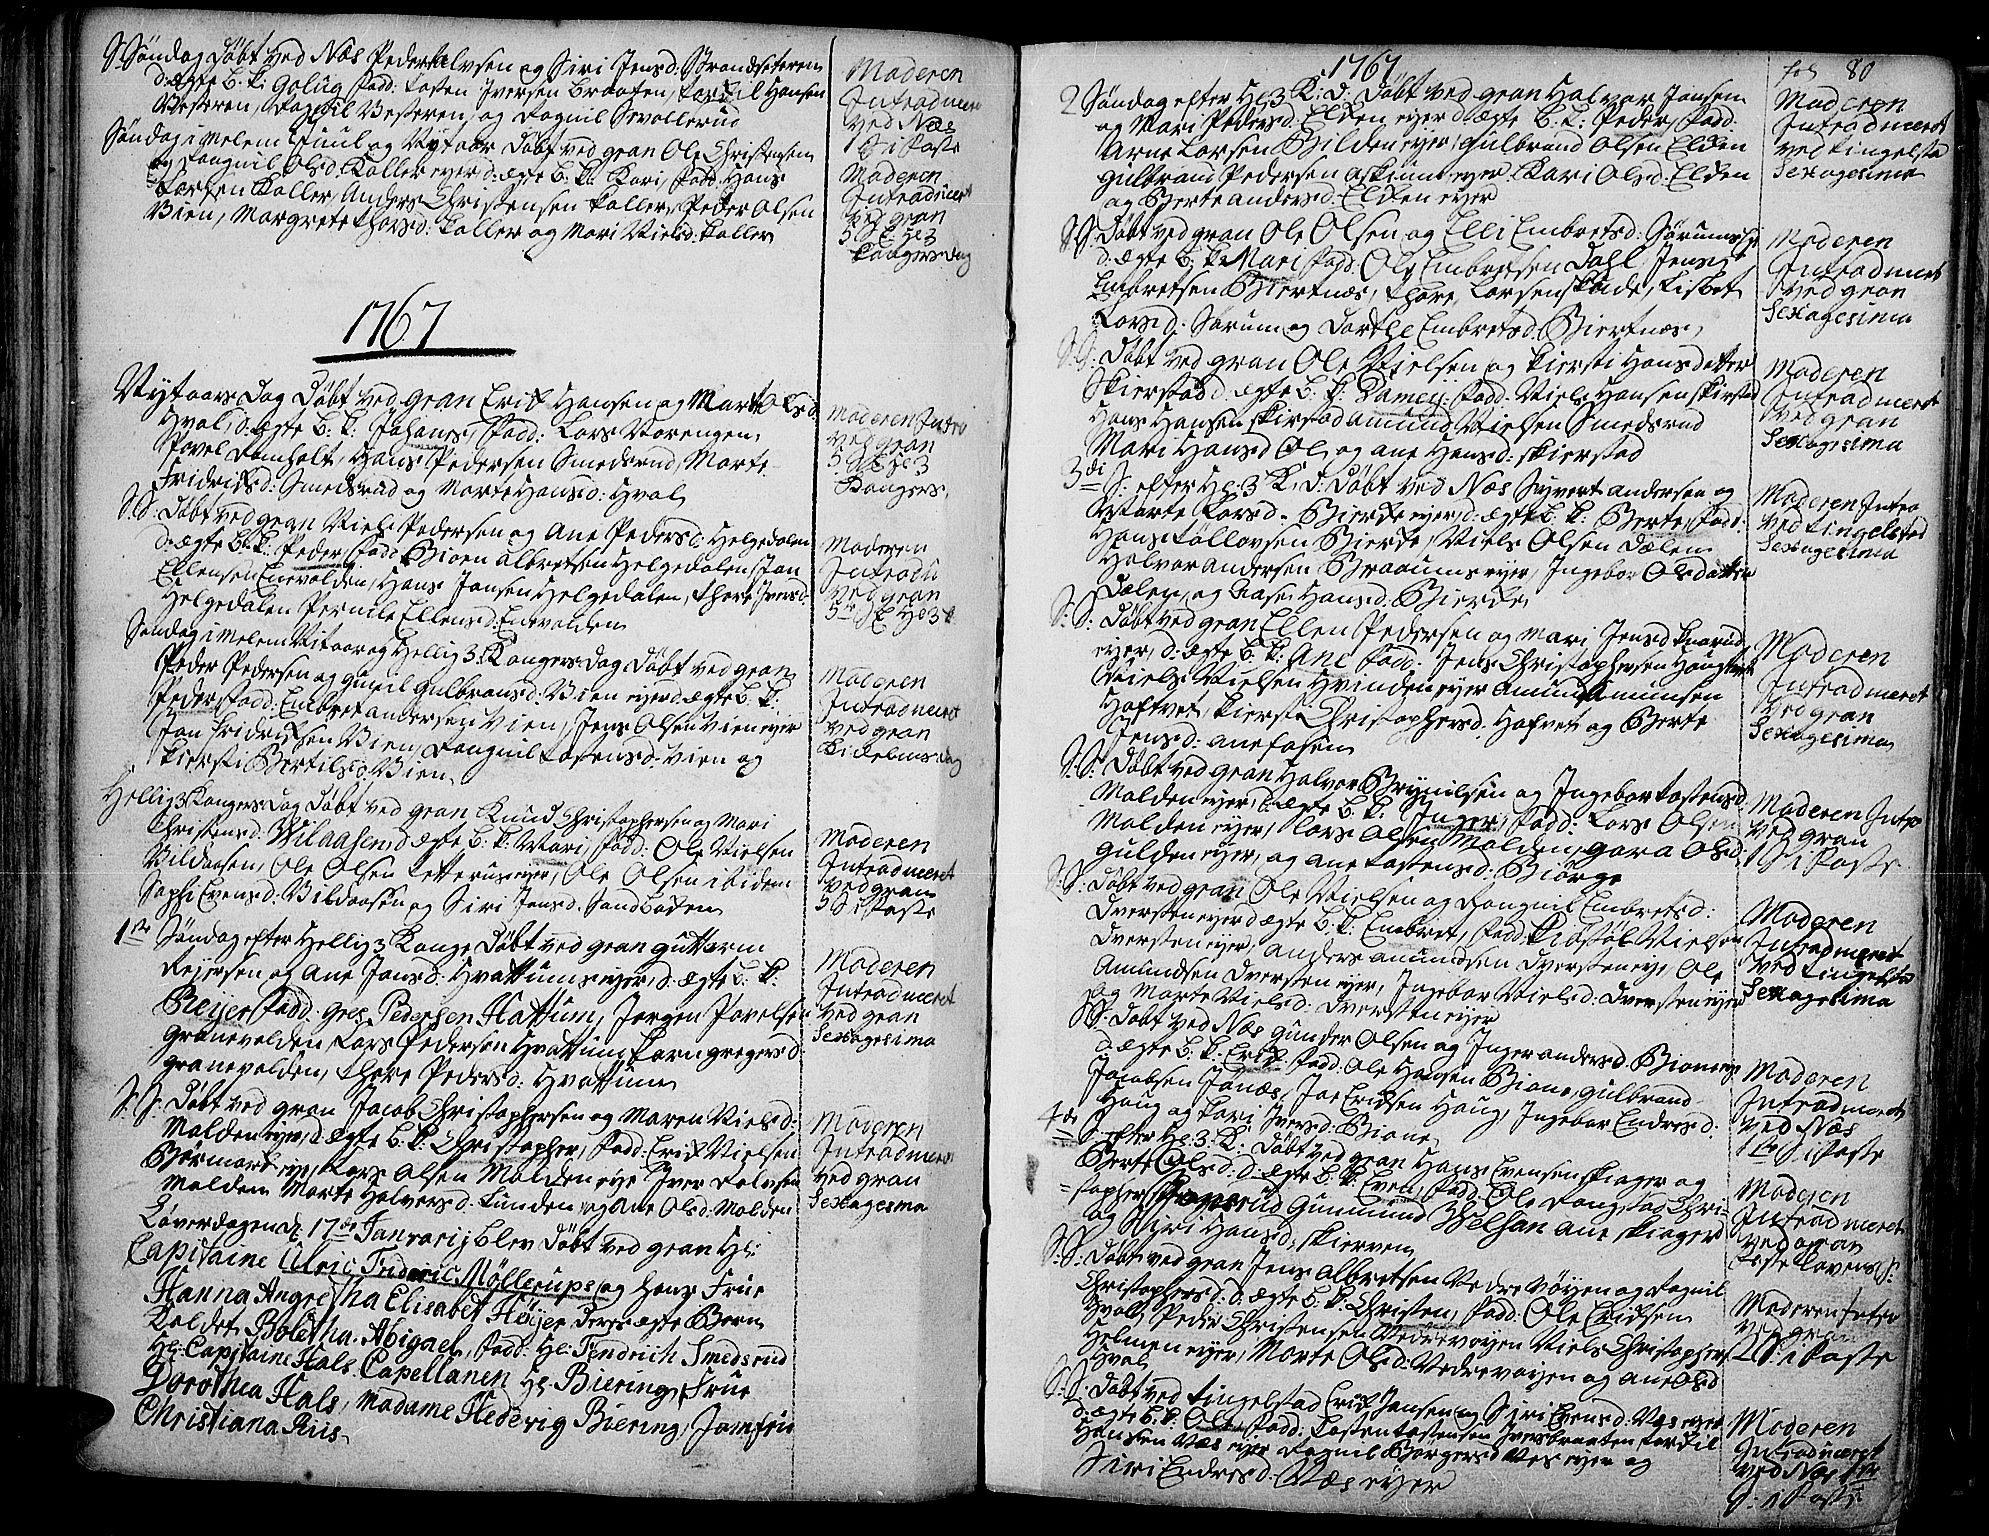 SAH, Gran prestekontor, Ministerialbok nr. 4, 1759-1775, s. 80